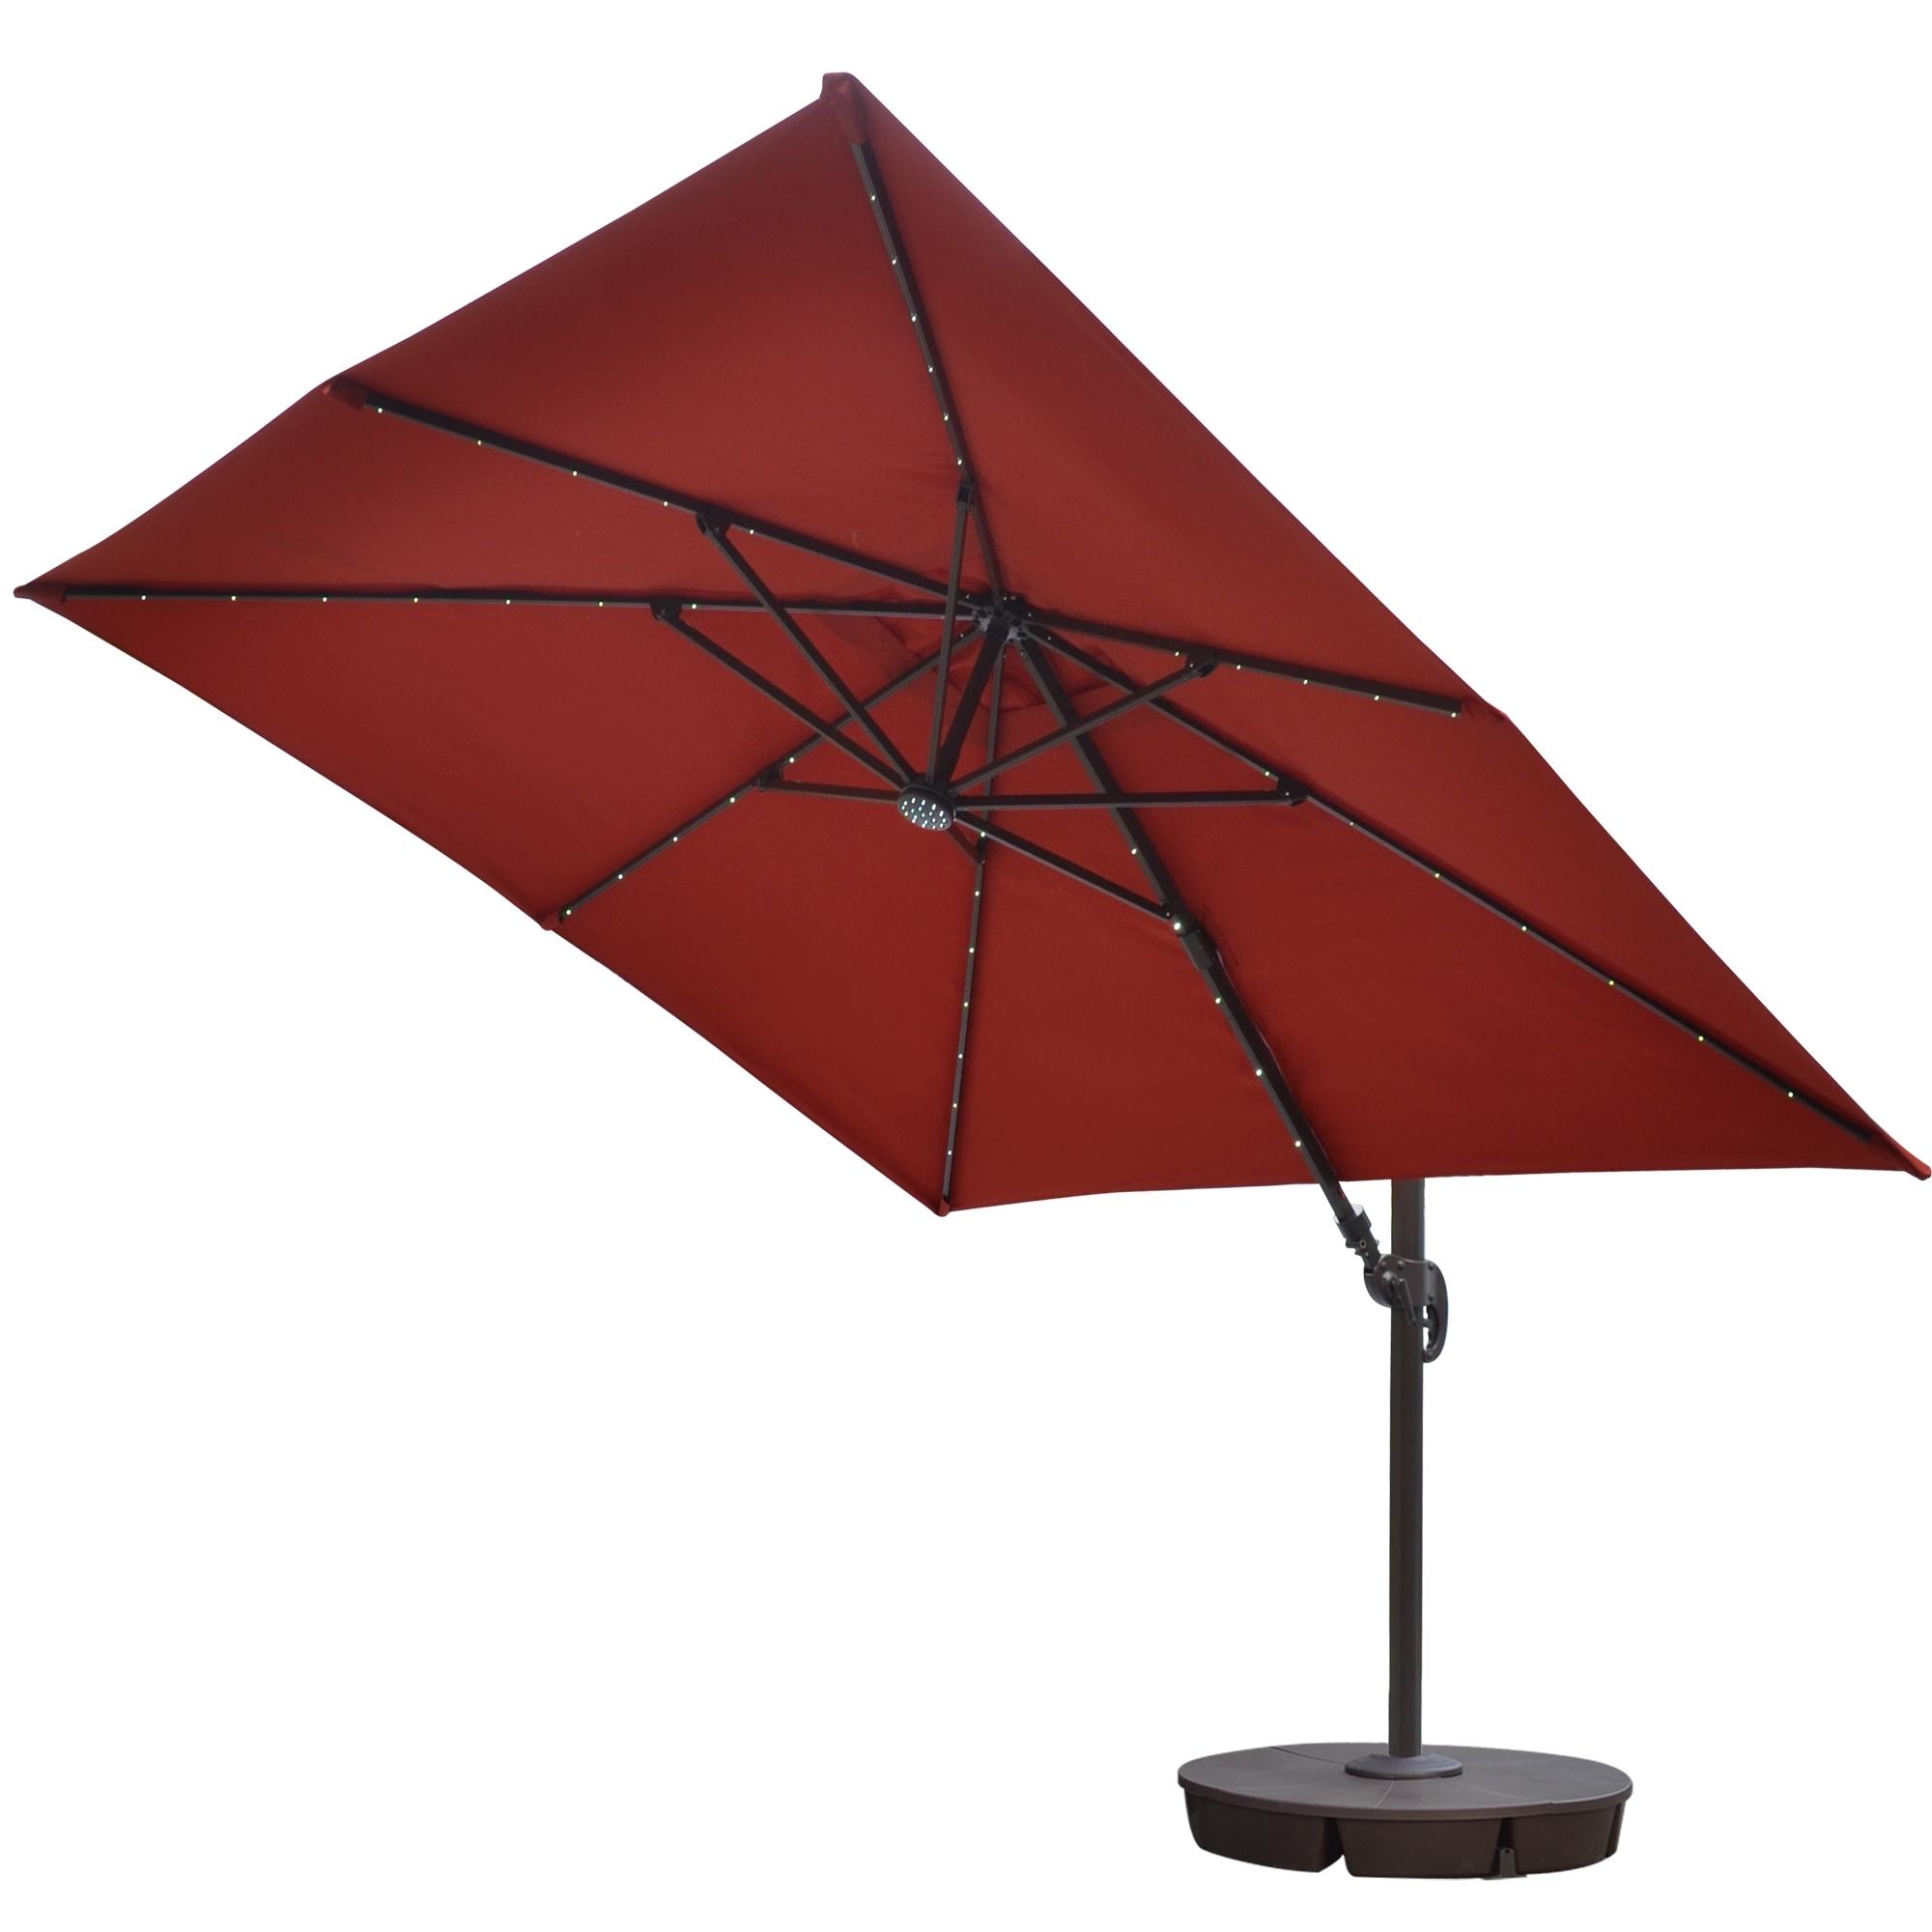 Most Recent Patio Umbrellas With Fans Inside Island Umbrella Santorini Ii Fiesta 10 Ft Square Cantilever Solar (View 13 of 20)